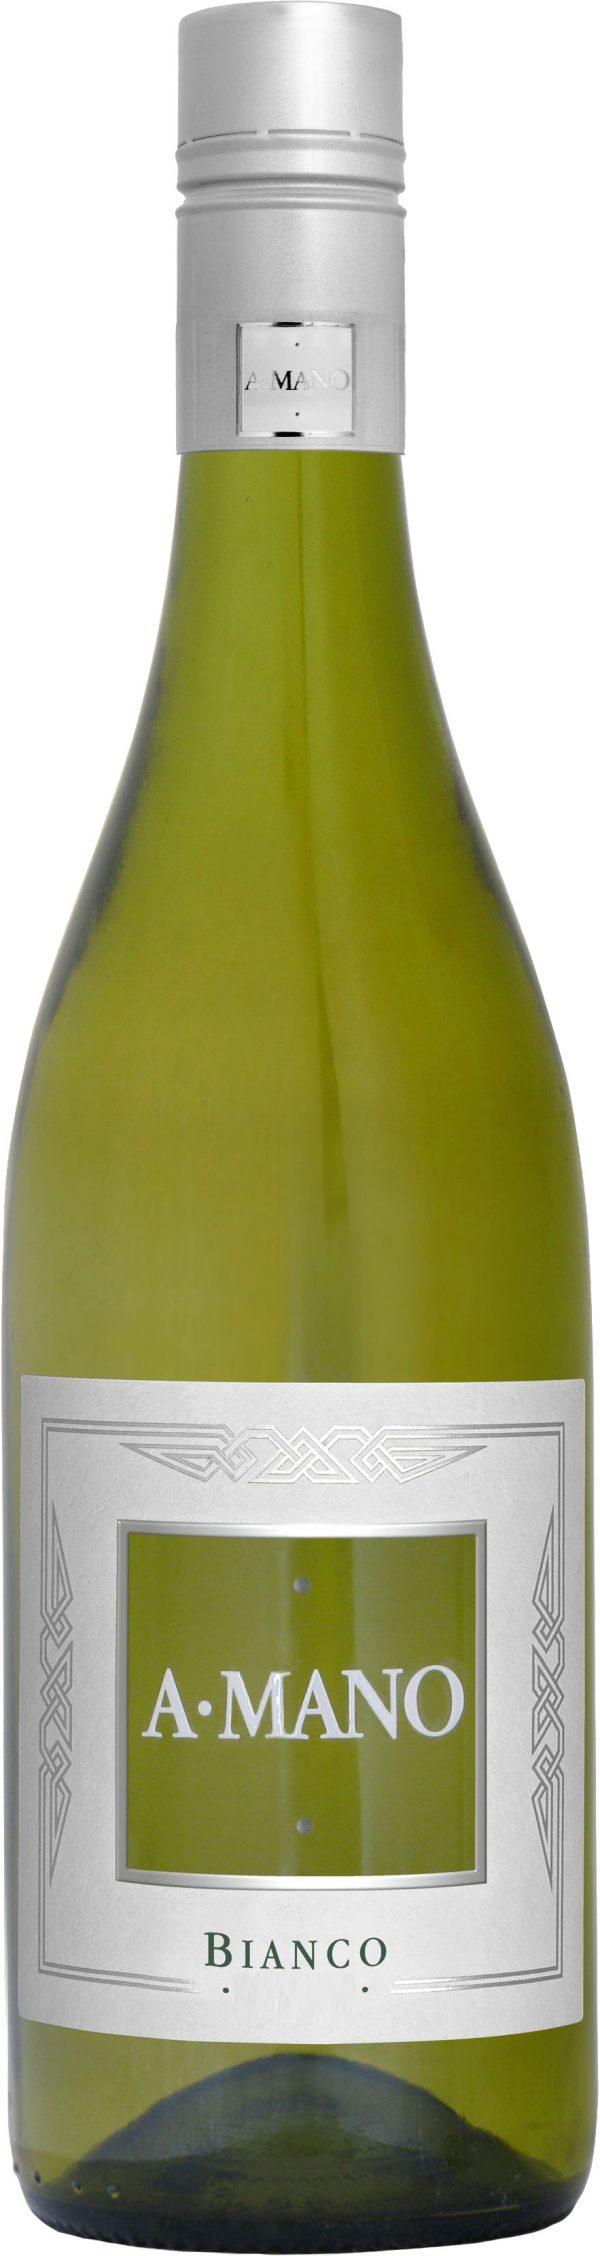 A Mano - Bianco Fiano Greco 2018 75cl Bottle